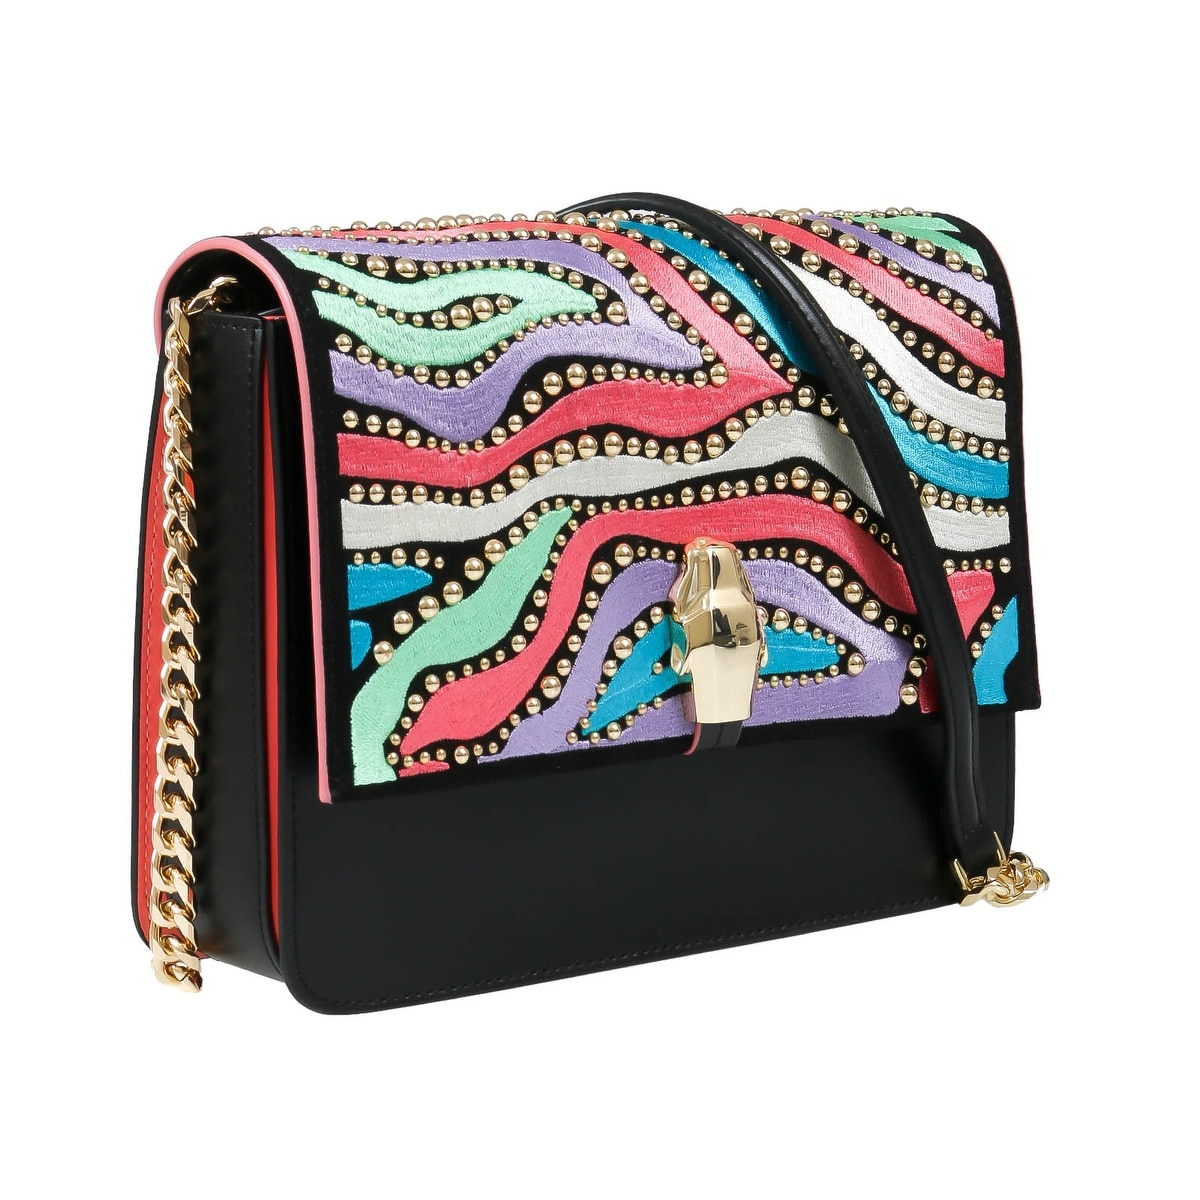 24e1808494b Roberto Cavalli Designer Handbags | Find Great Designer Store Deals  Shopping at Overstock